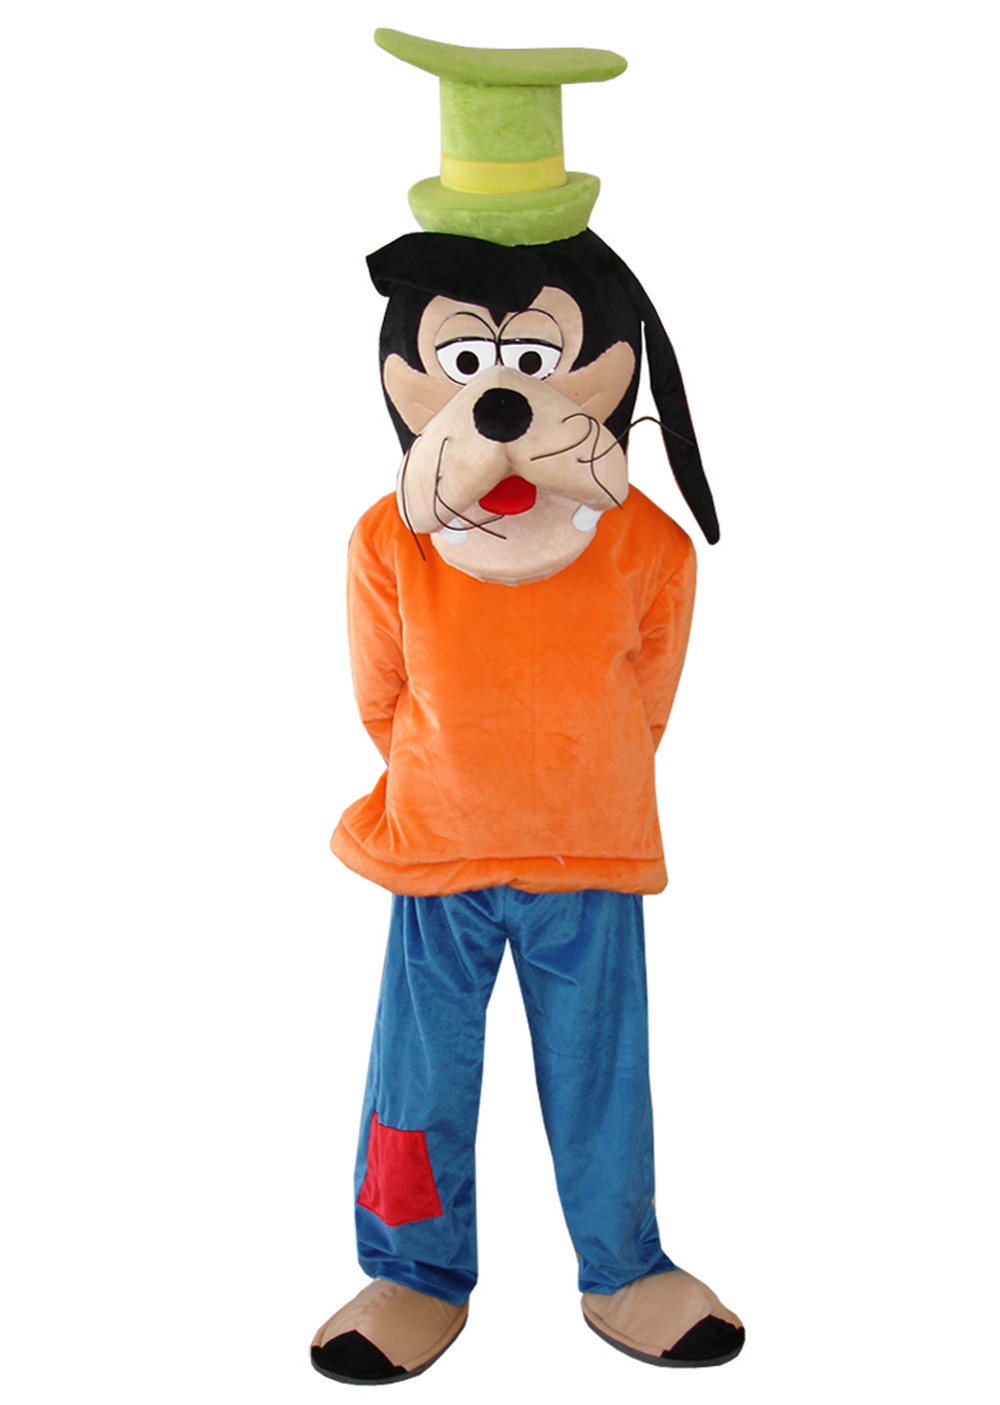 cosplay costumes Goofy Dog Mascot Costume Goofy Mascot Costume Dog Mascot Free Shipping